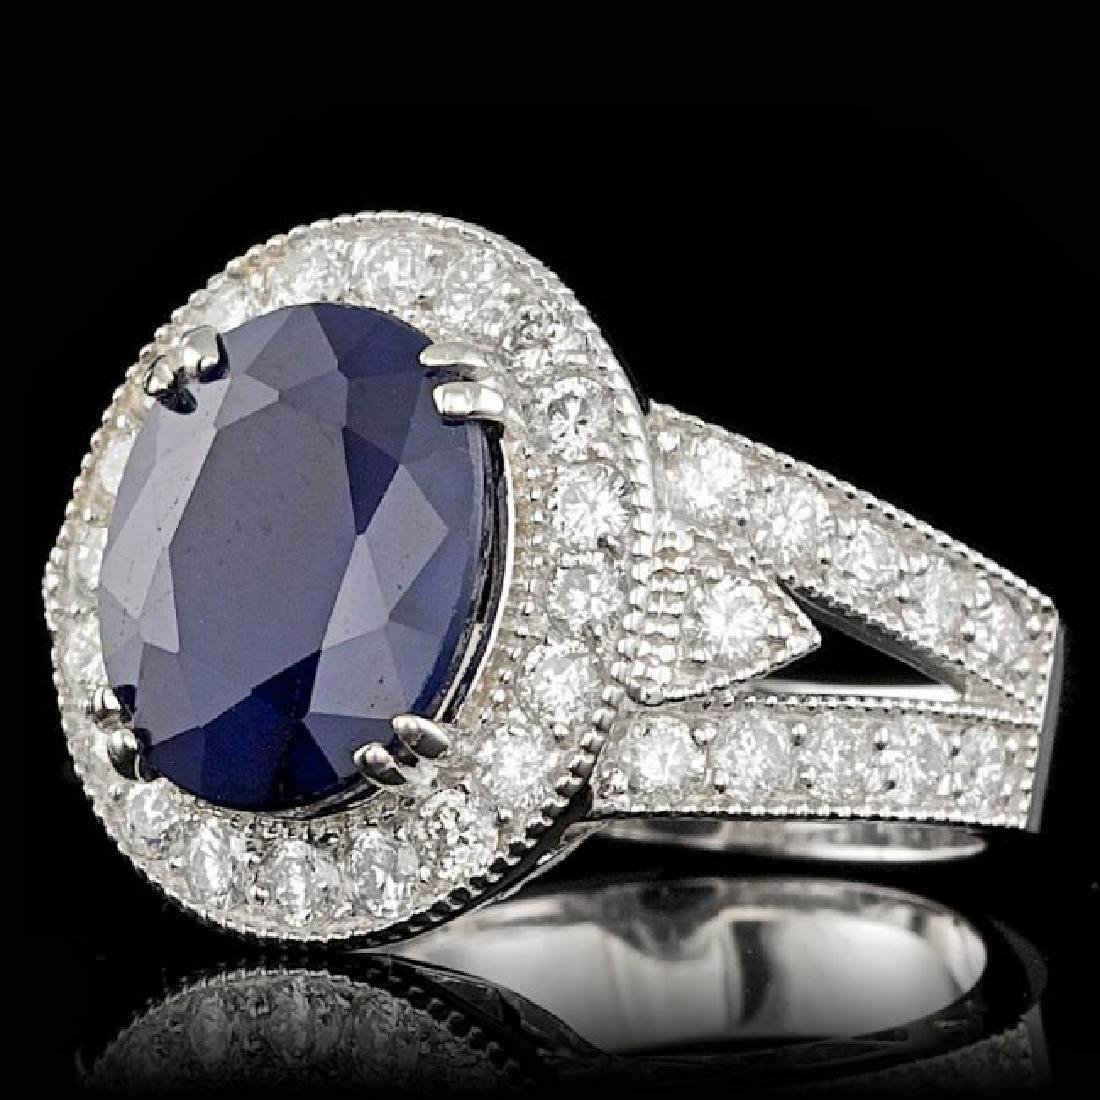 14k Gold 6.50ct Sapphire 1.60ct Diamond Ring - 2